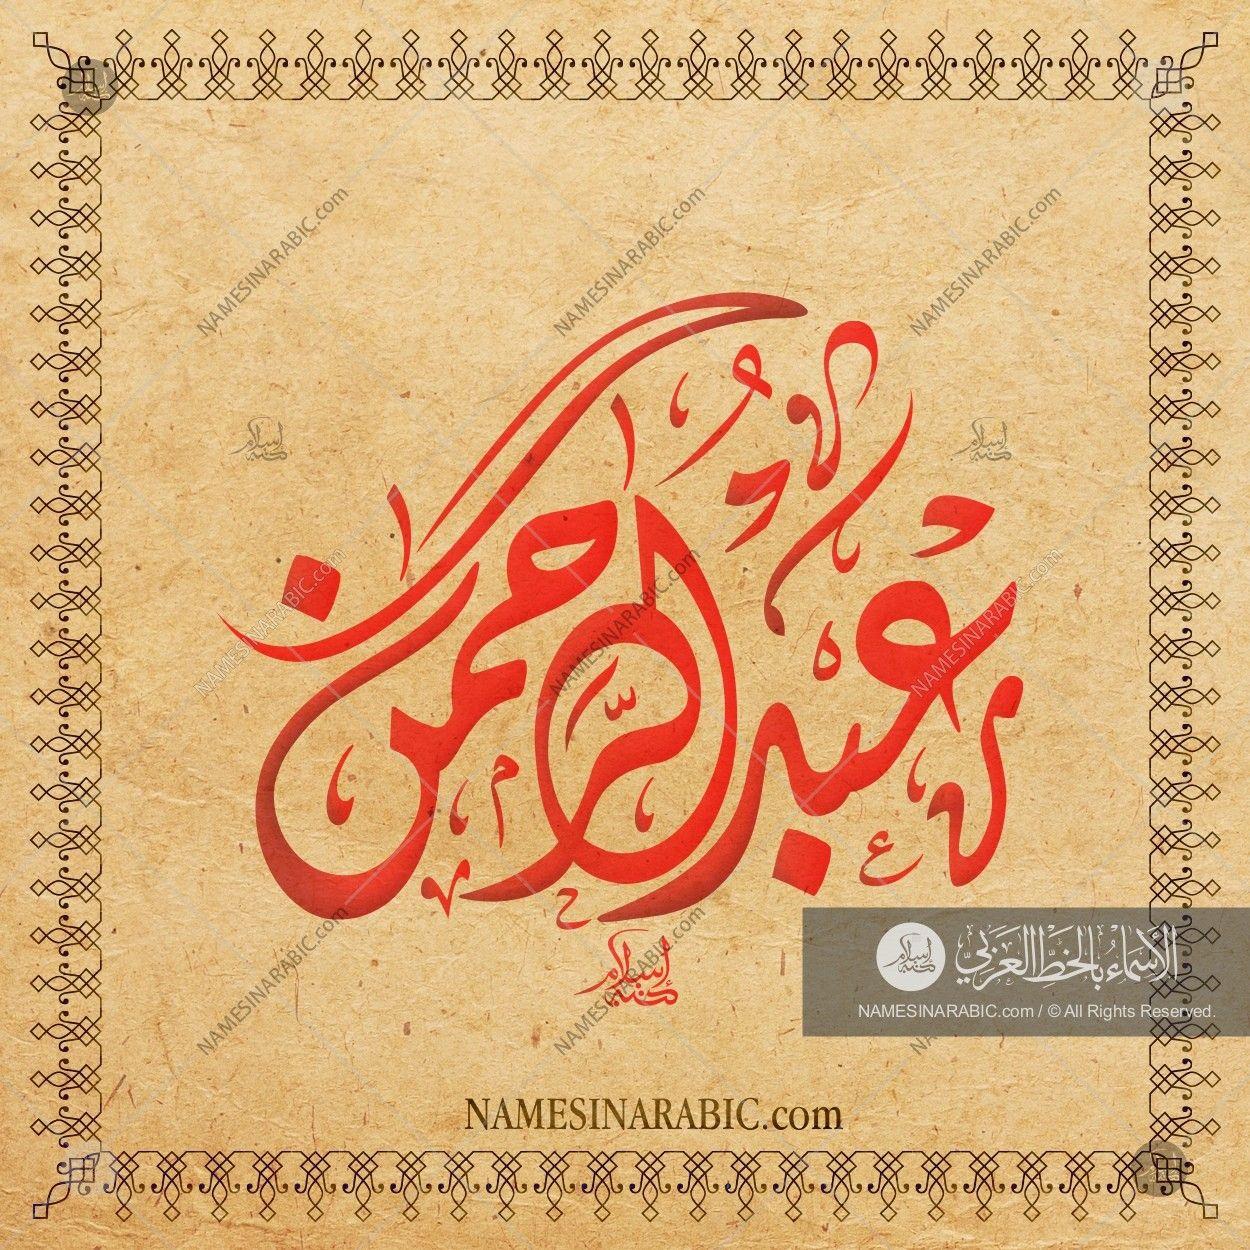 Abdul Rahman عبد الرحمن Names In Arabic Calligraphy Name 5627 Arabic Calligraphy Design Islamic Calligraphy Islamic Caligraphy Art